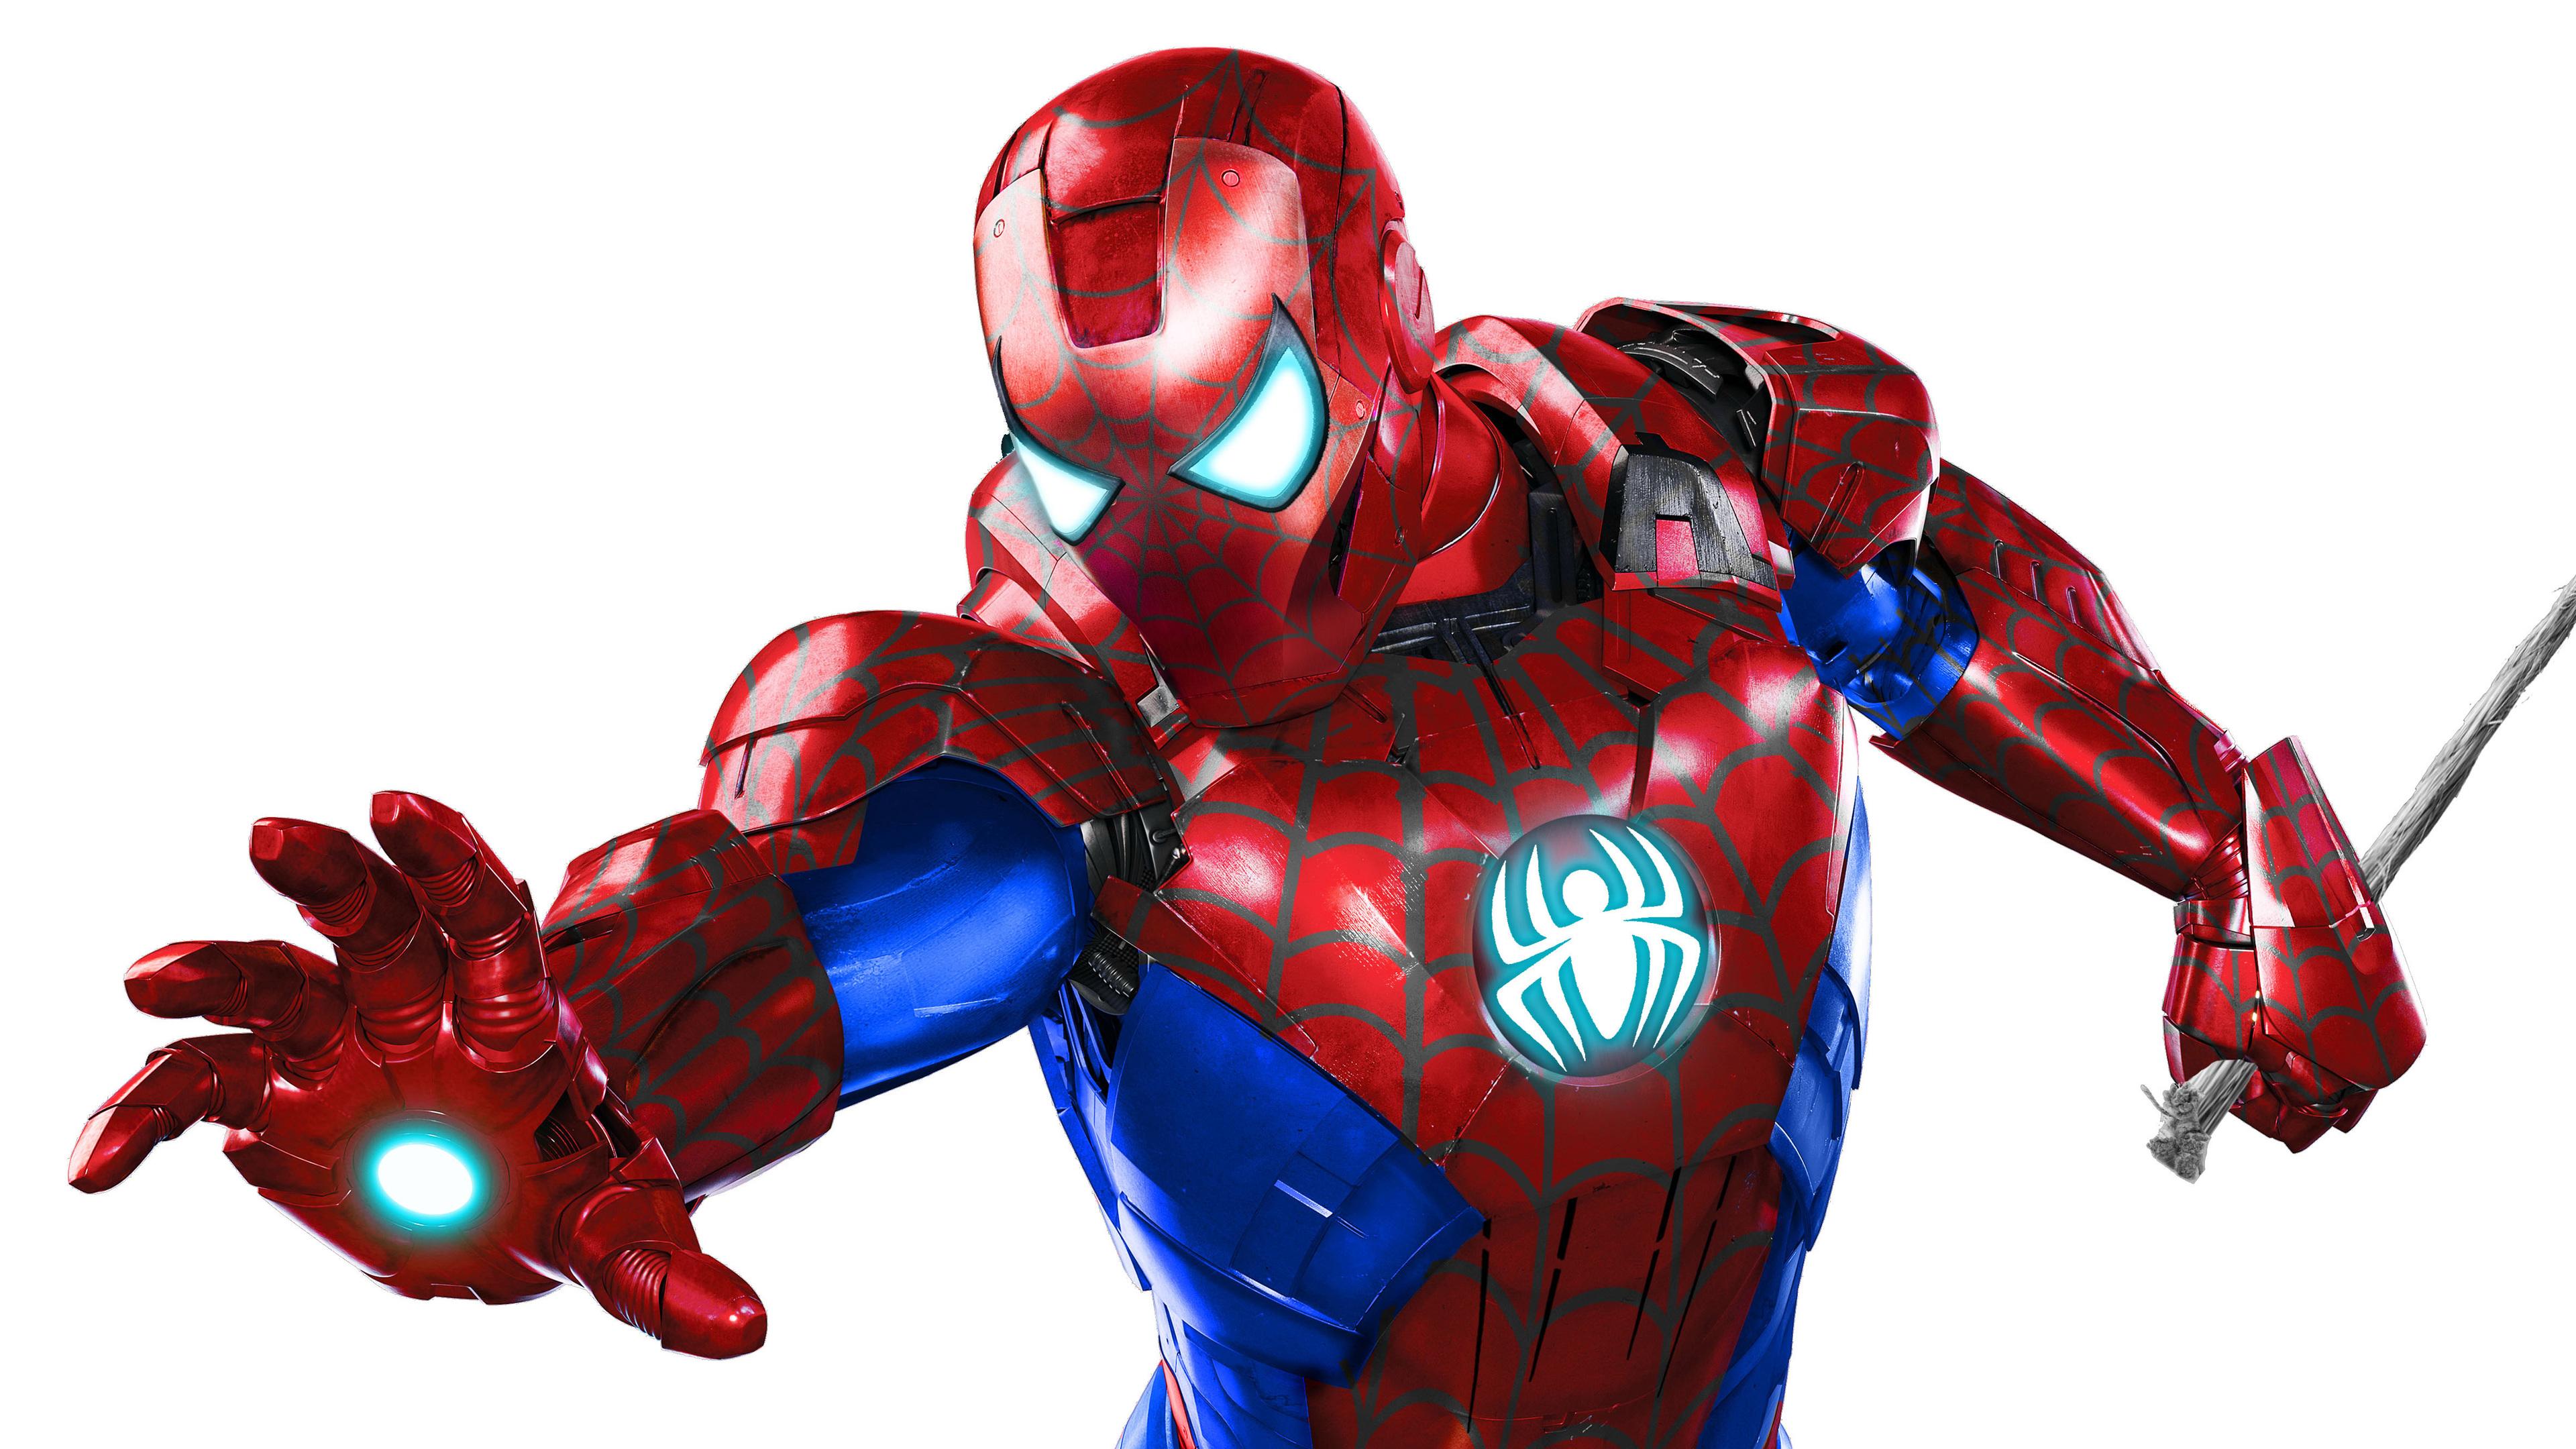 Wallpaper 4k Iron Spider Man Suit 4k 4k Wallpapers Artist